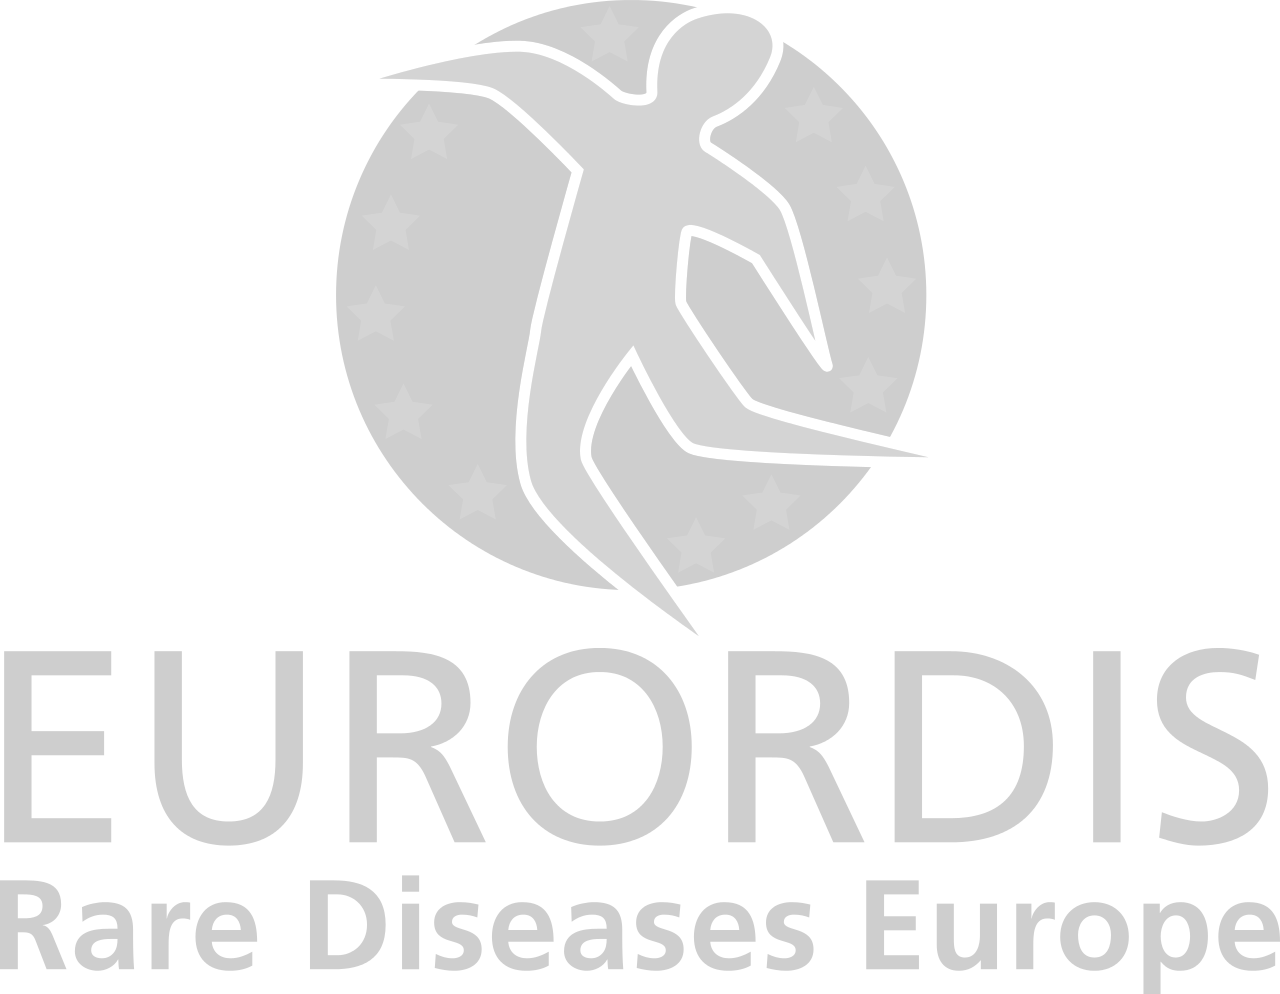 Pseudomyxoma Survivor is a member of Eurordis, Rare Disease Europe